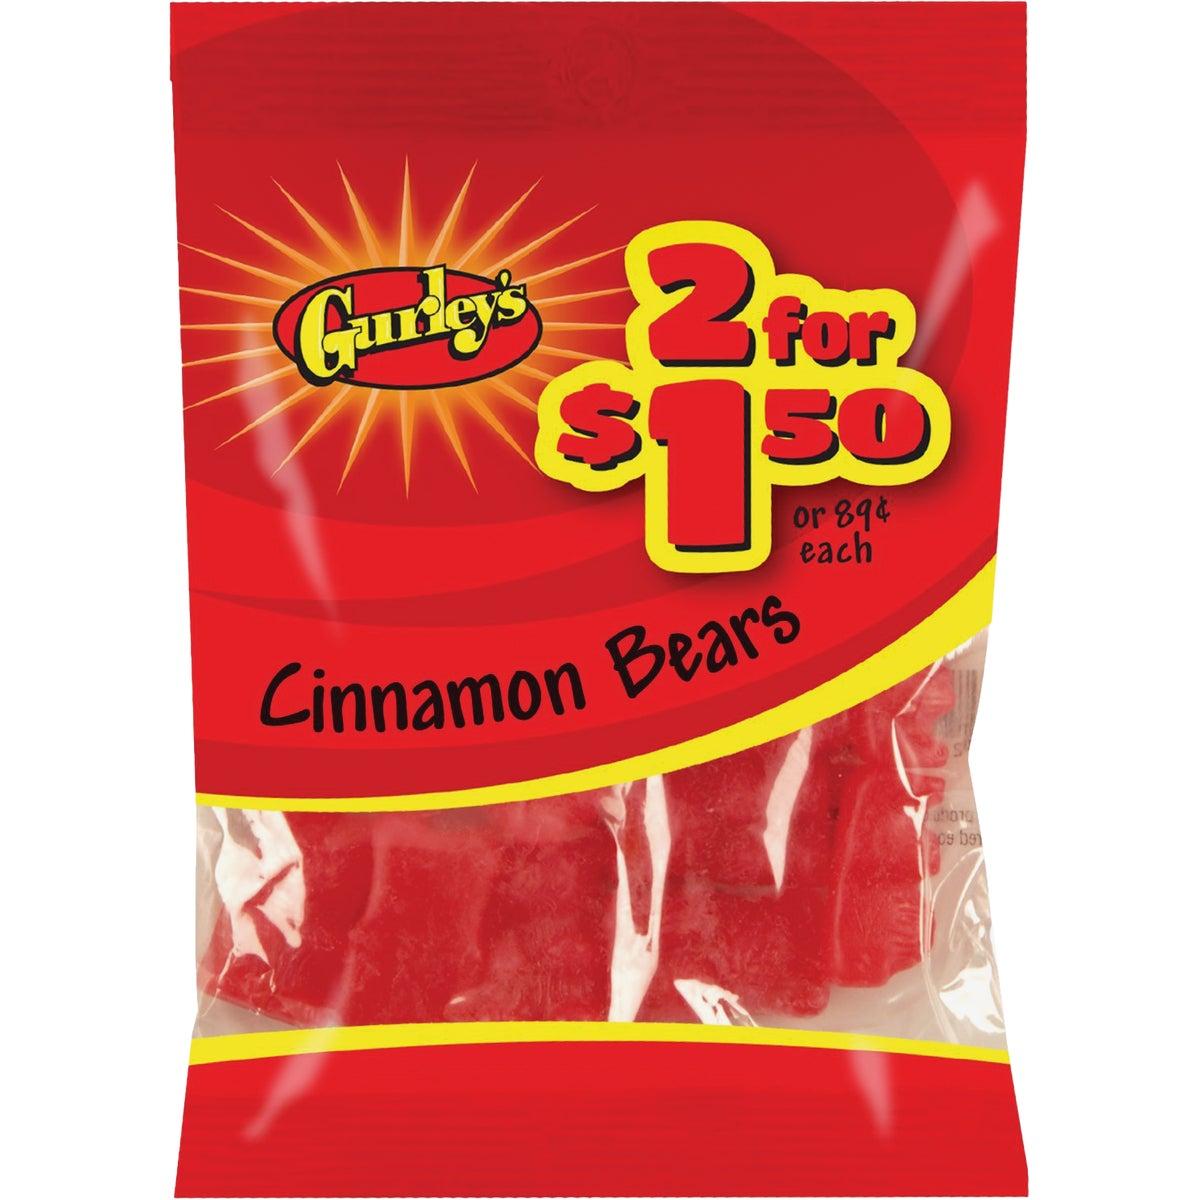 4OZ CINNAMON BEARS CANDY - 01223 by Farleys  Sathers